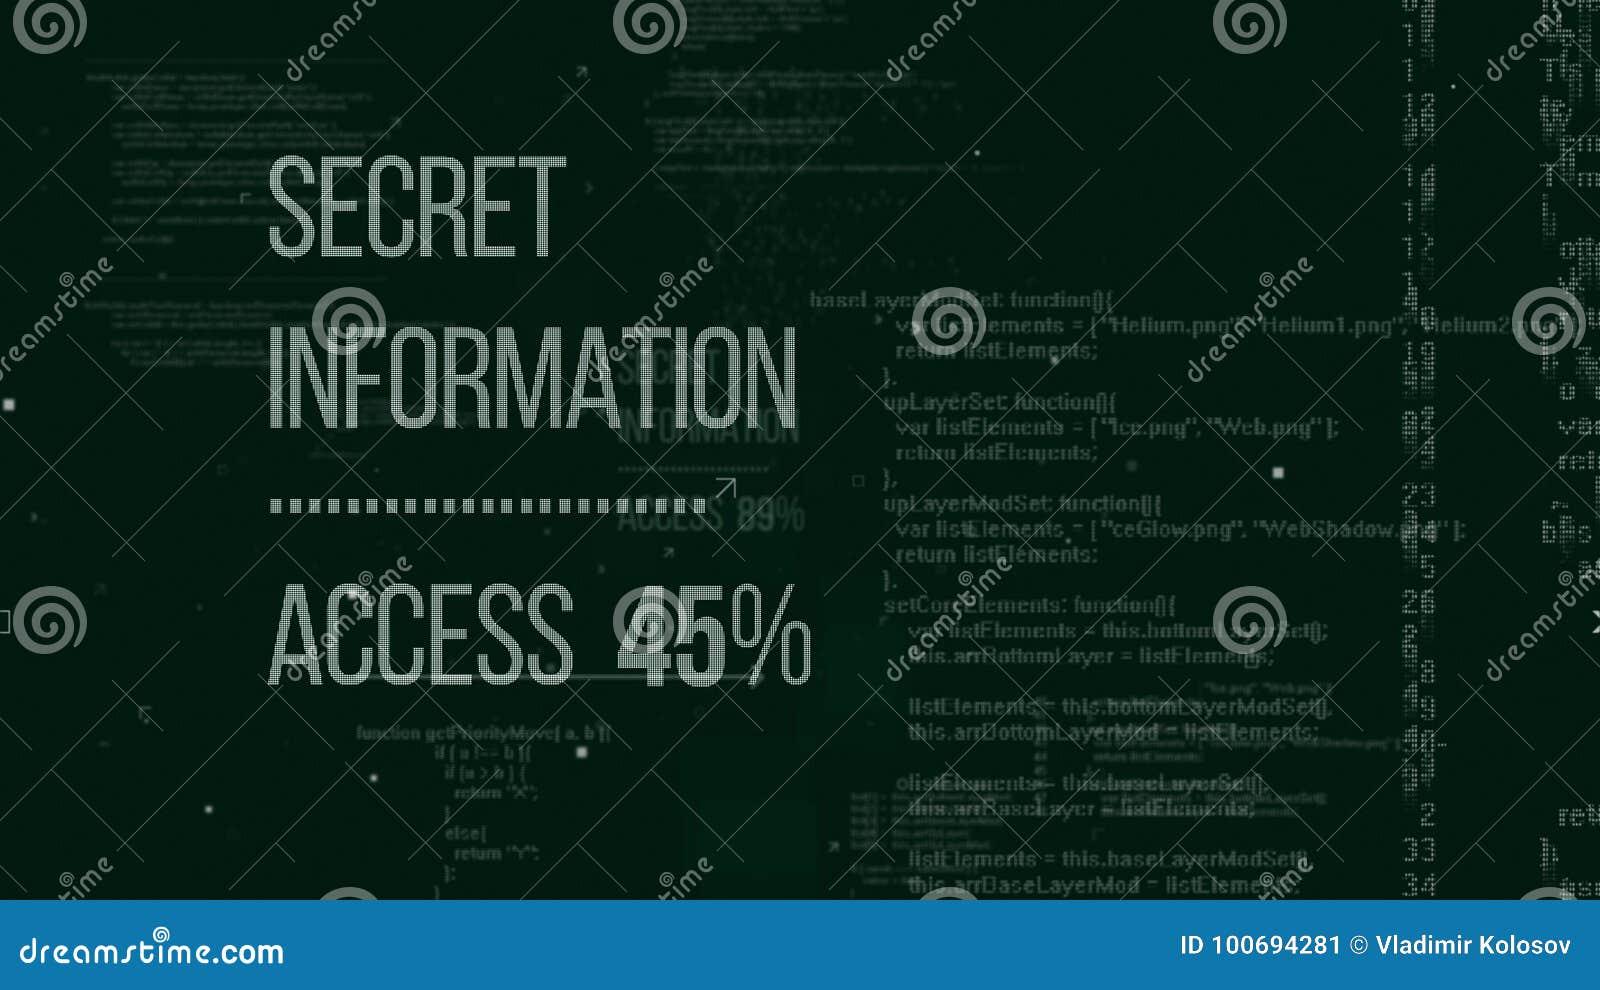 Secret Hackers Code Illustration Stock Illustration - Illustration